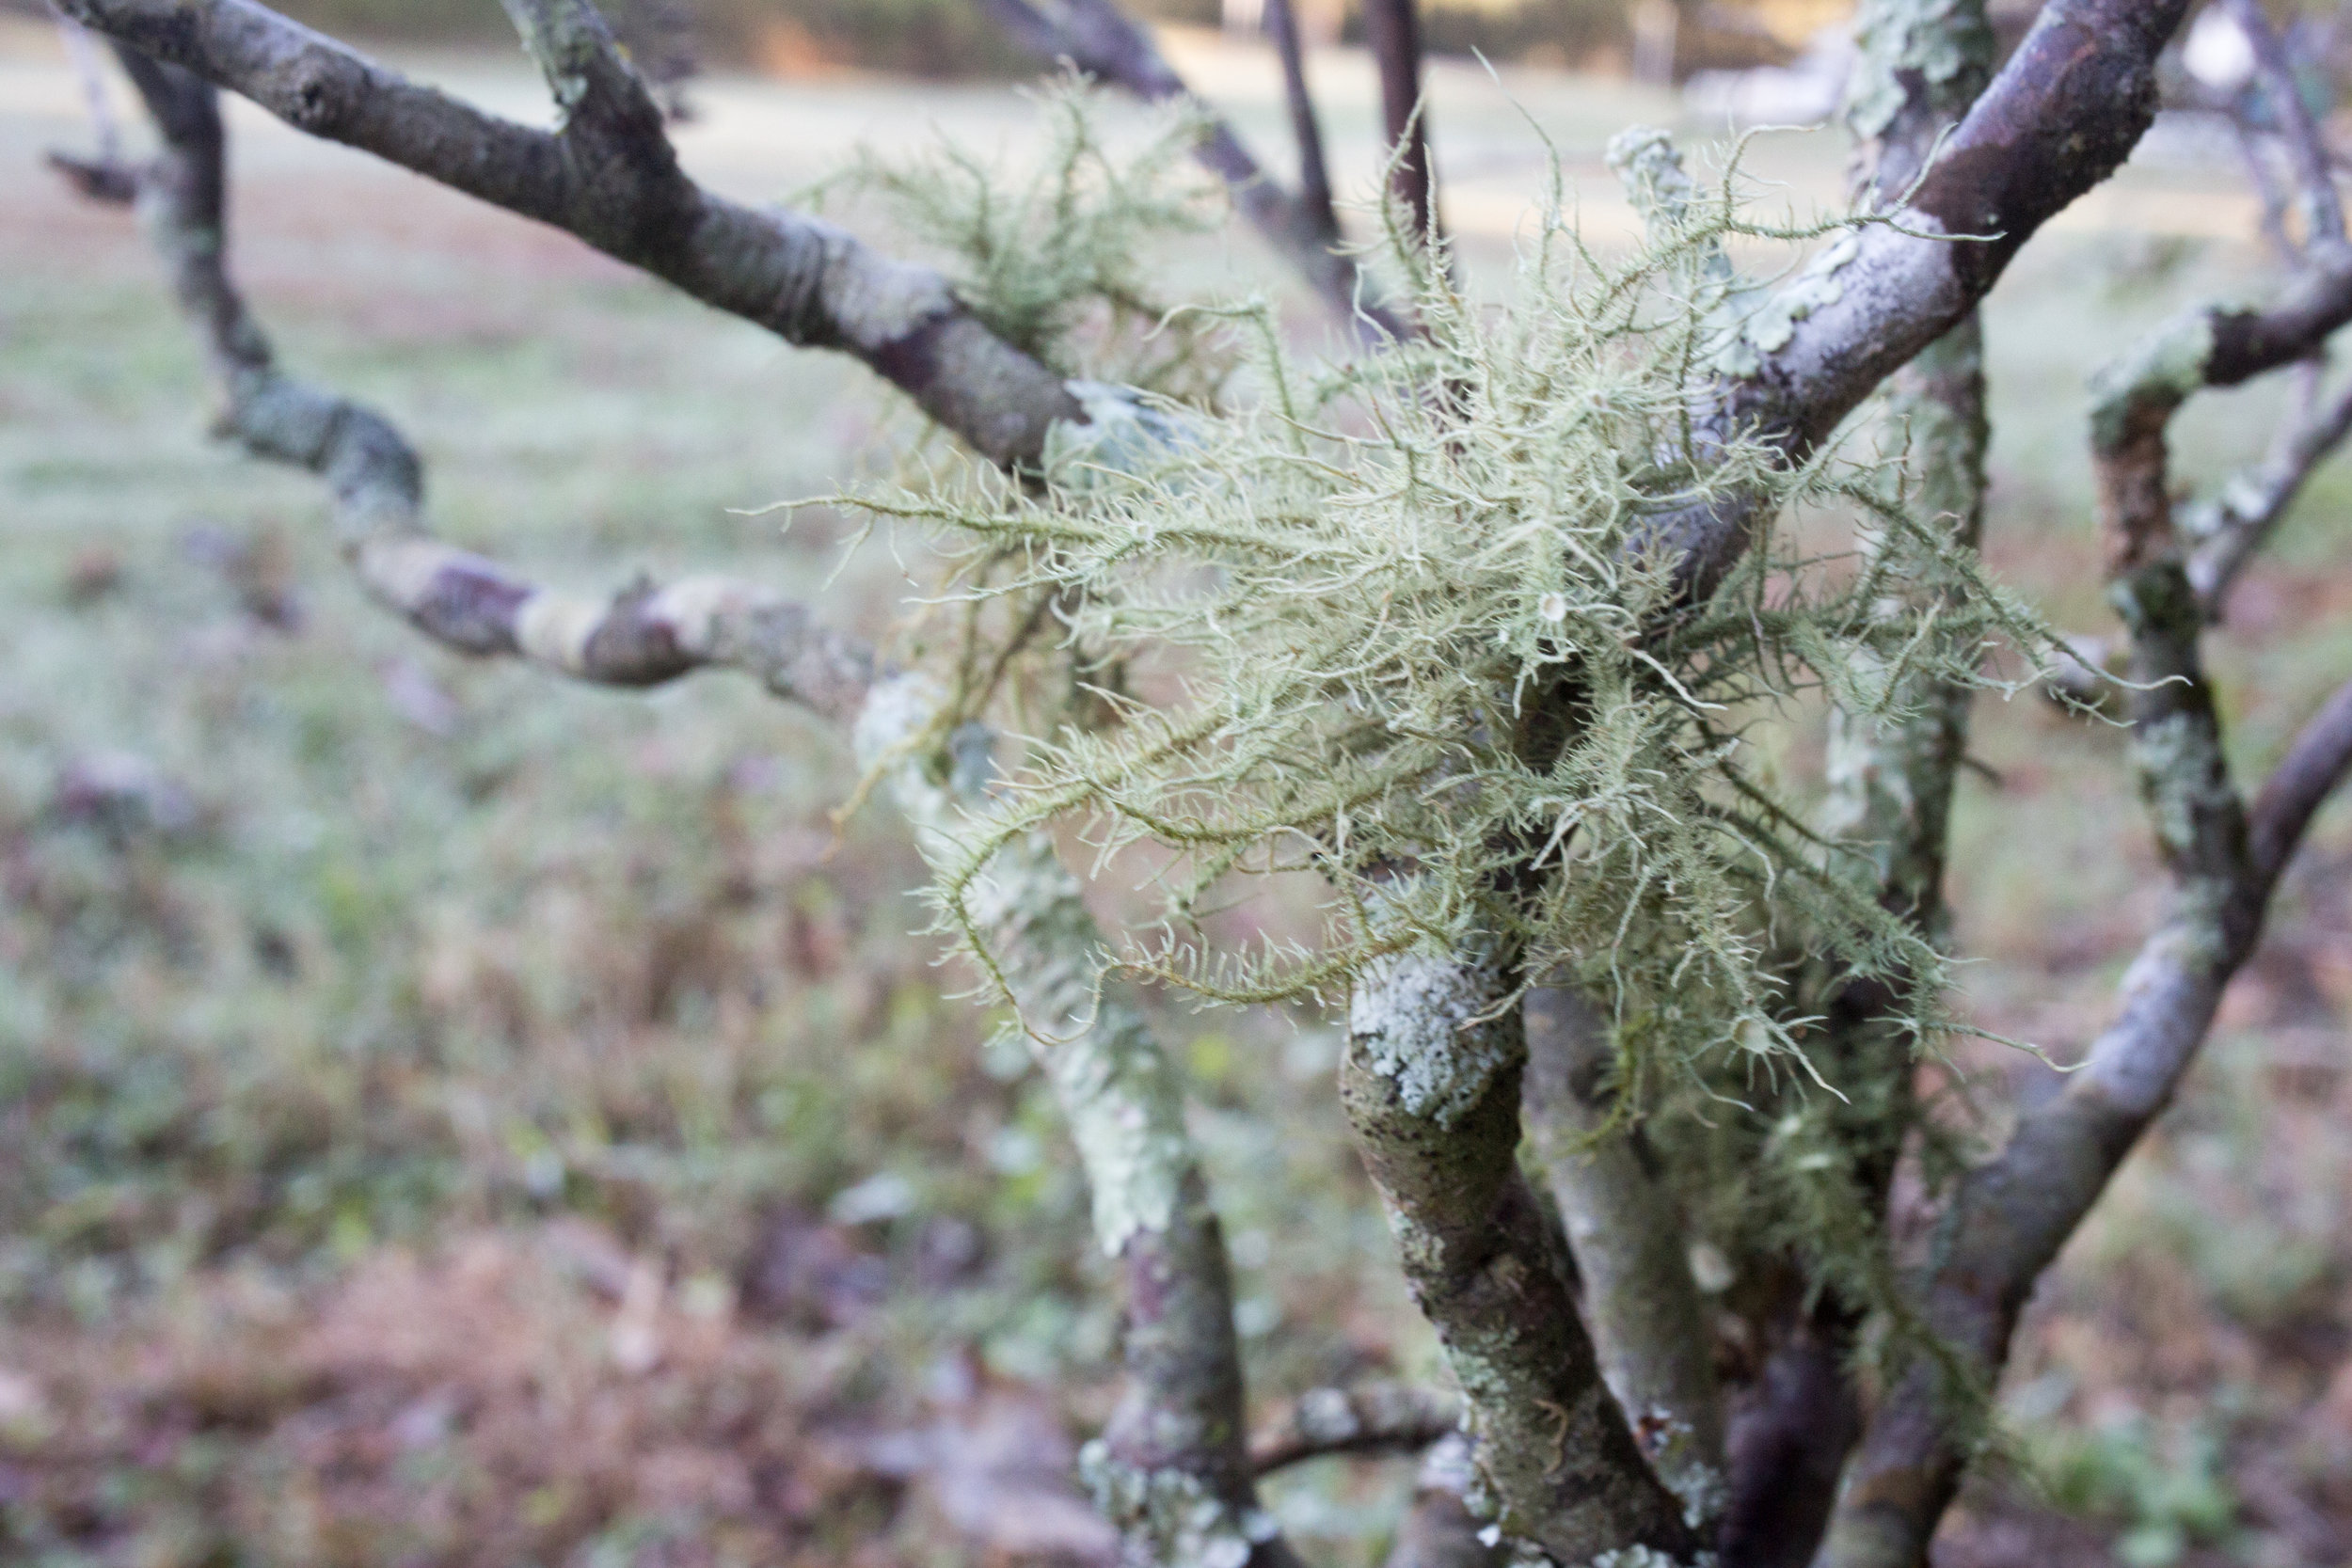 Usnea lichen, October 18, 2018